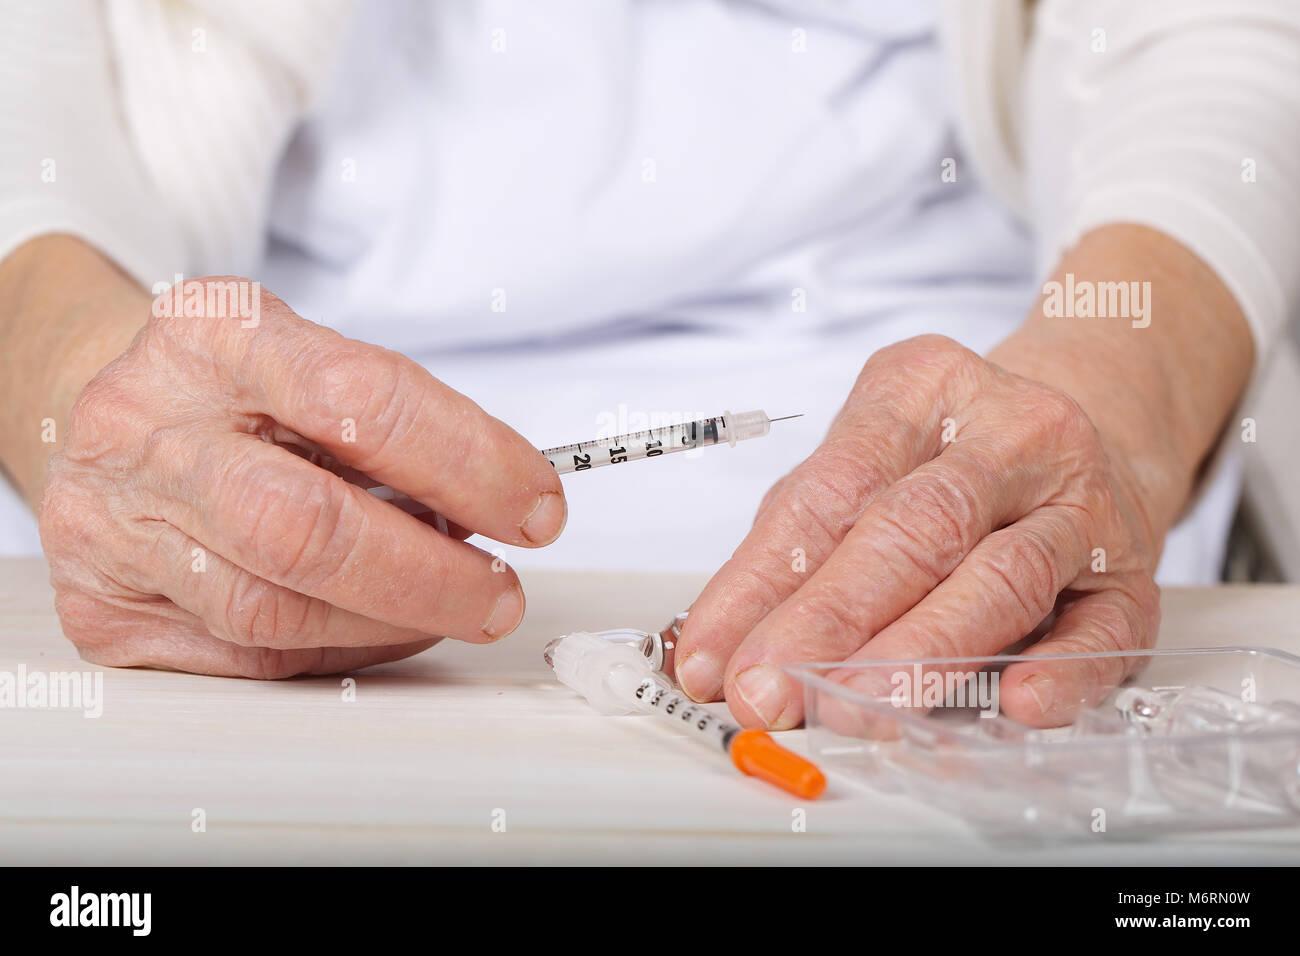 diabetis prevention stock photos diabetis prevention stock images